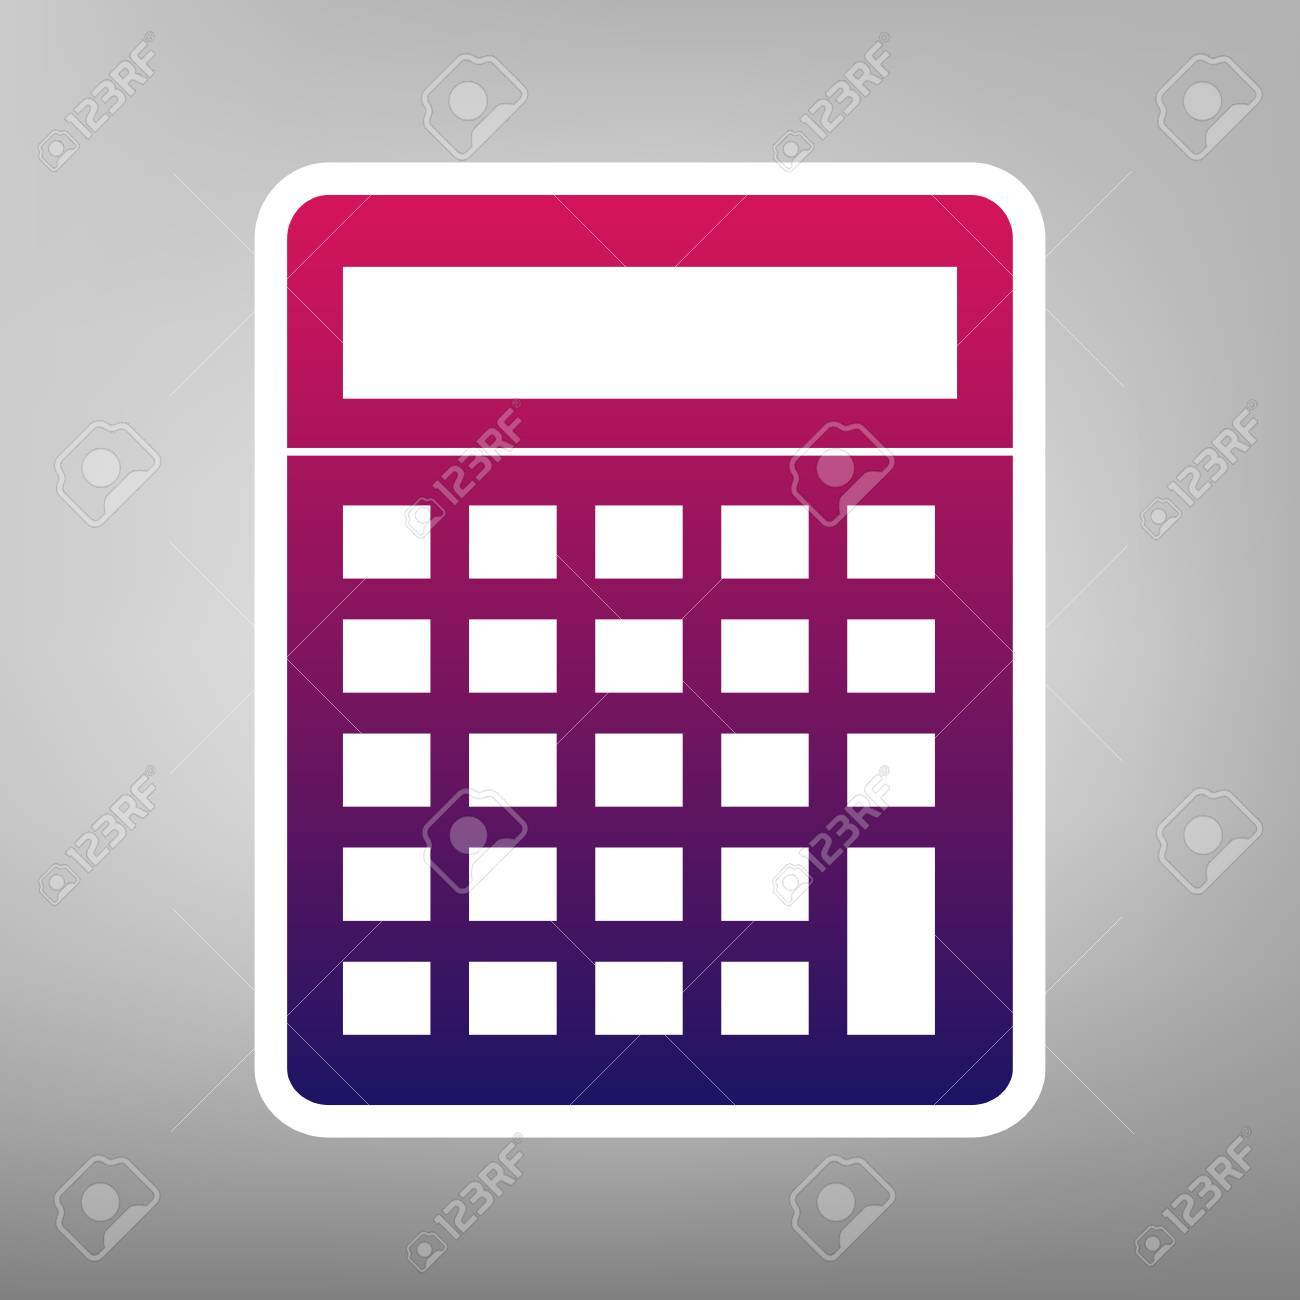 calculator simple sign vector purple gradient icon on white